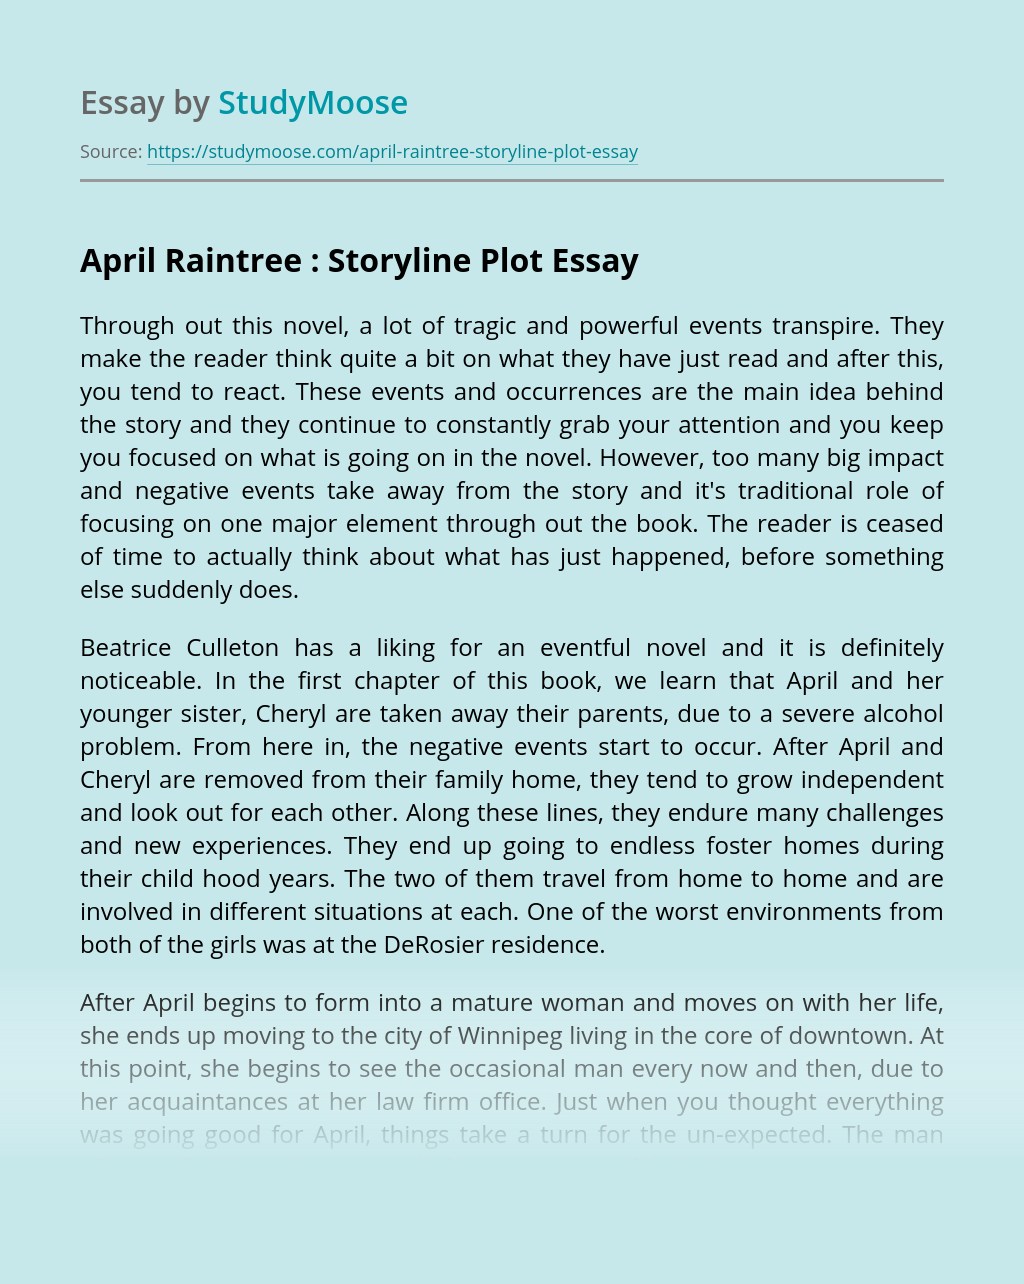 April Raintree : Storyline Plot